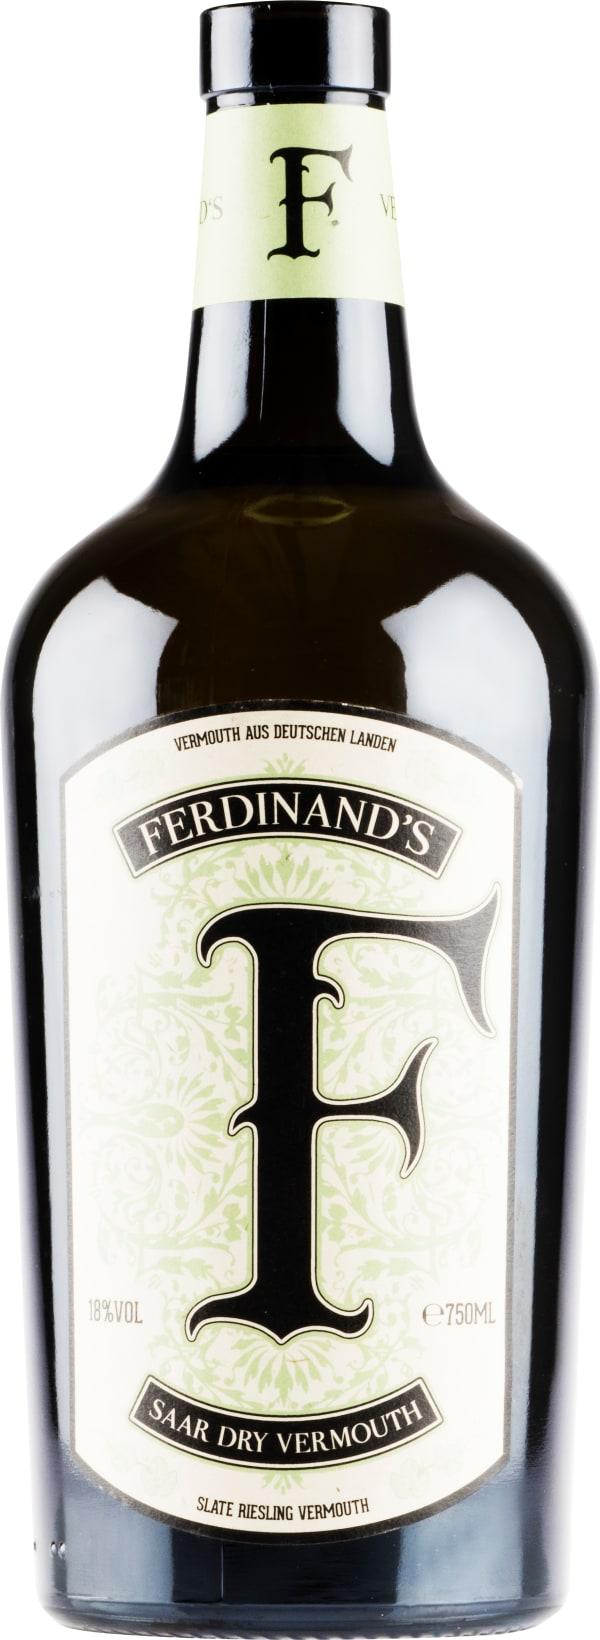 Ferdinand's Saar Dry Vermouth